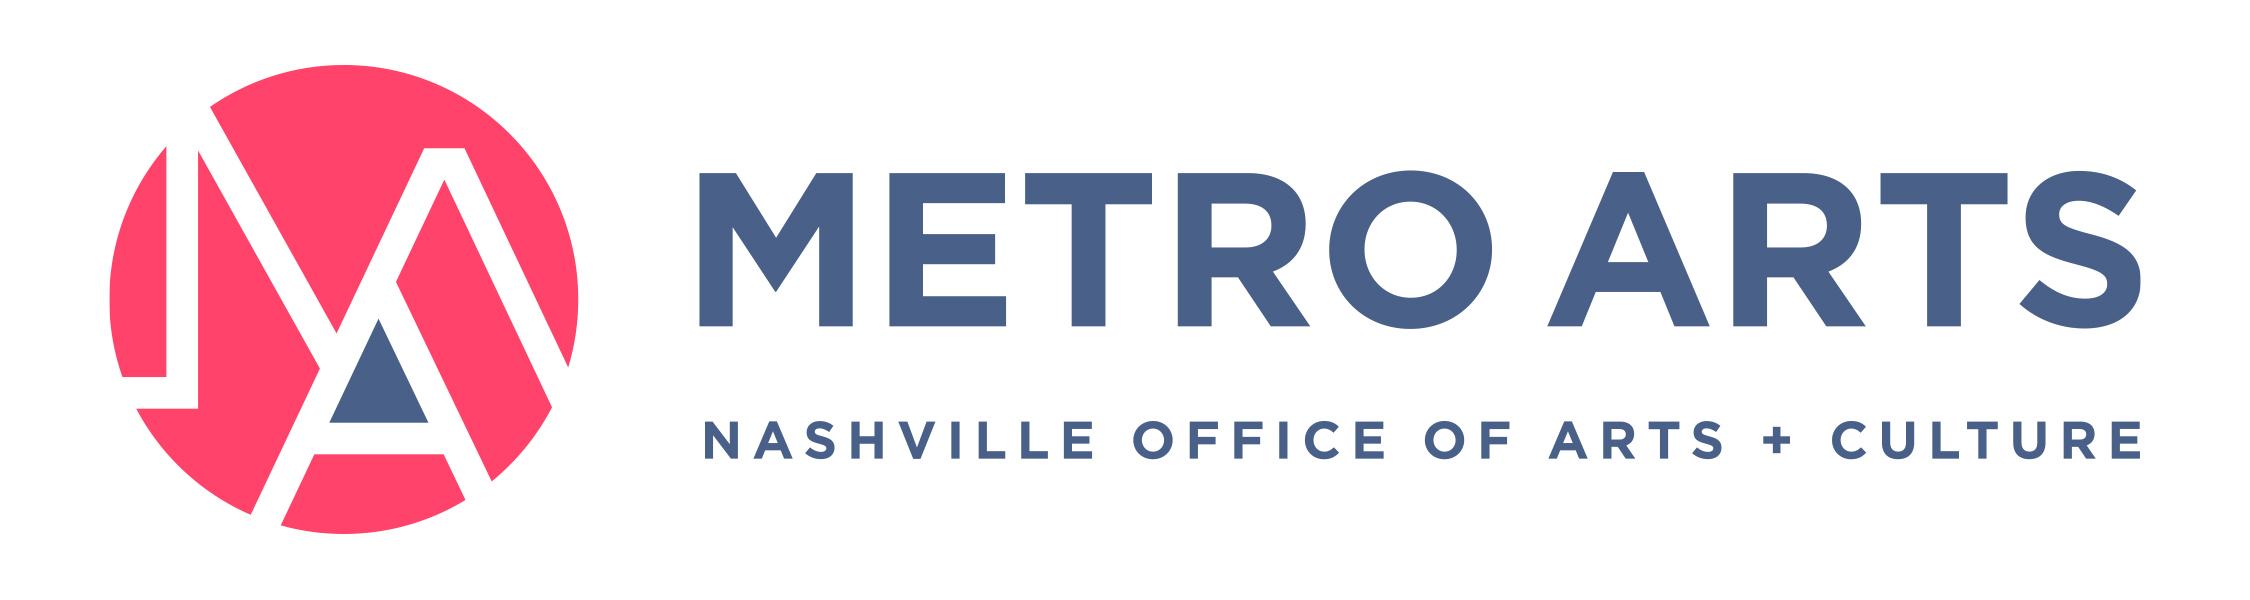 MetroArts-logo-horizontal-CMYK.jpg